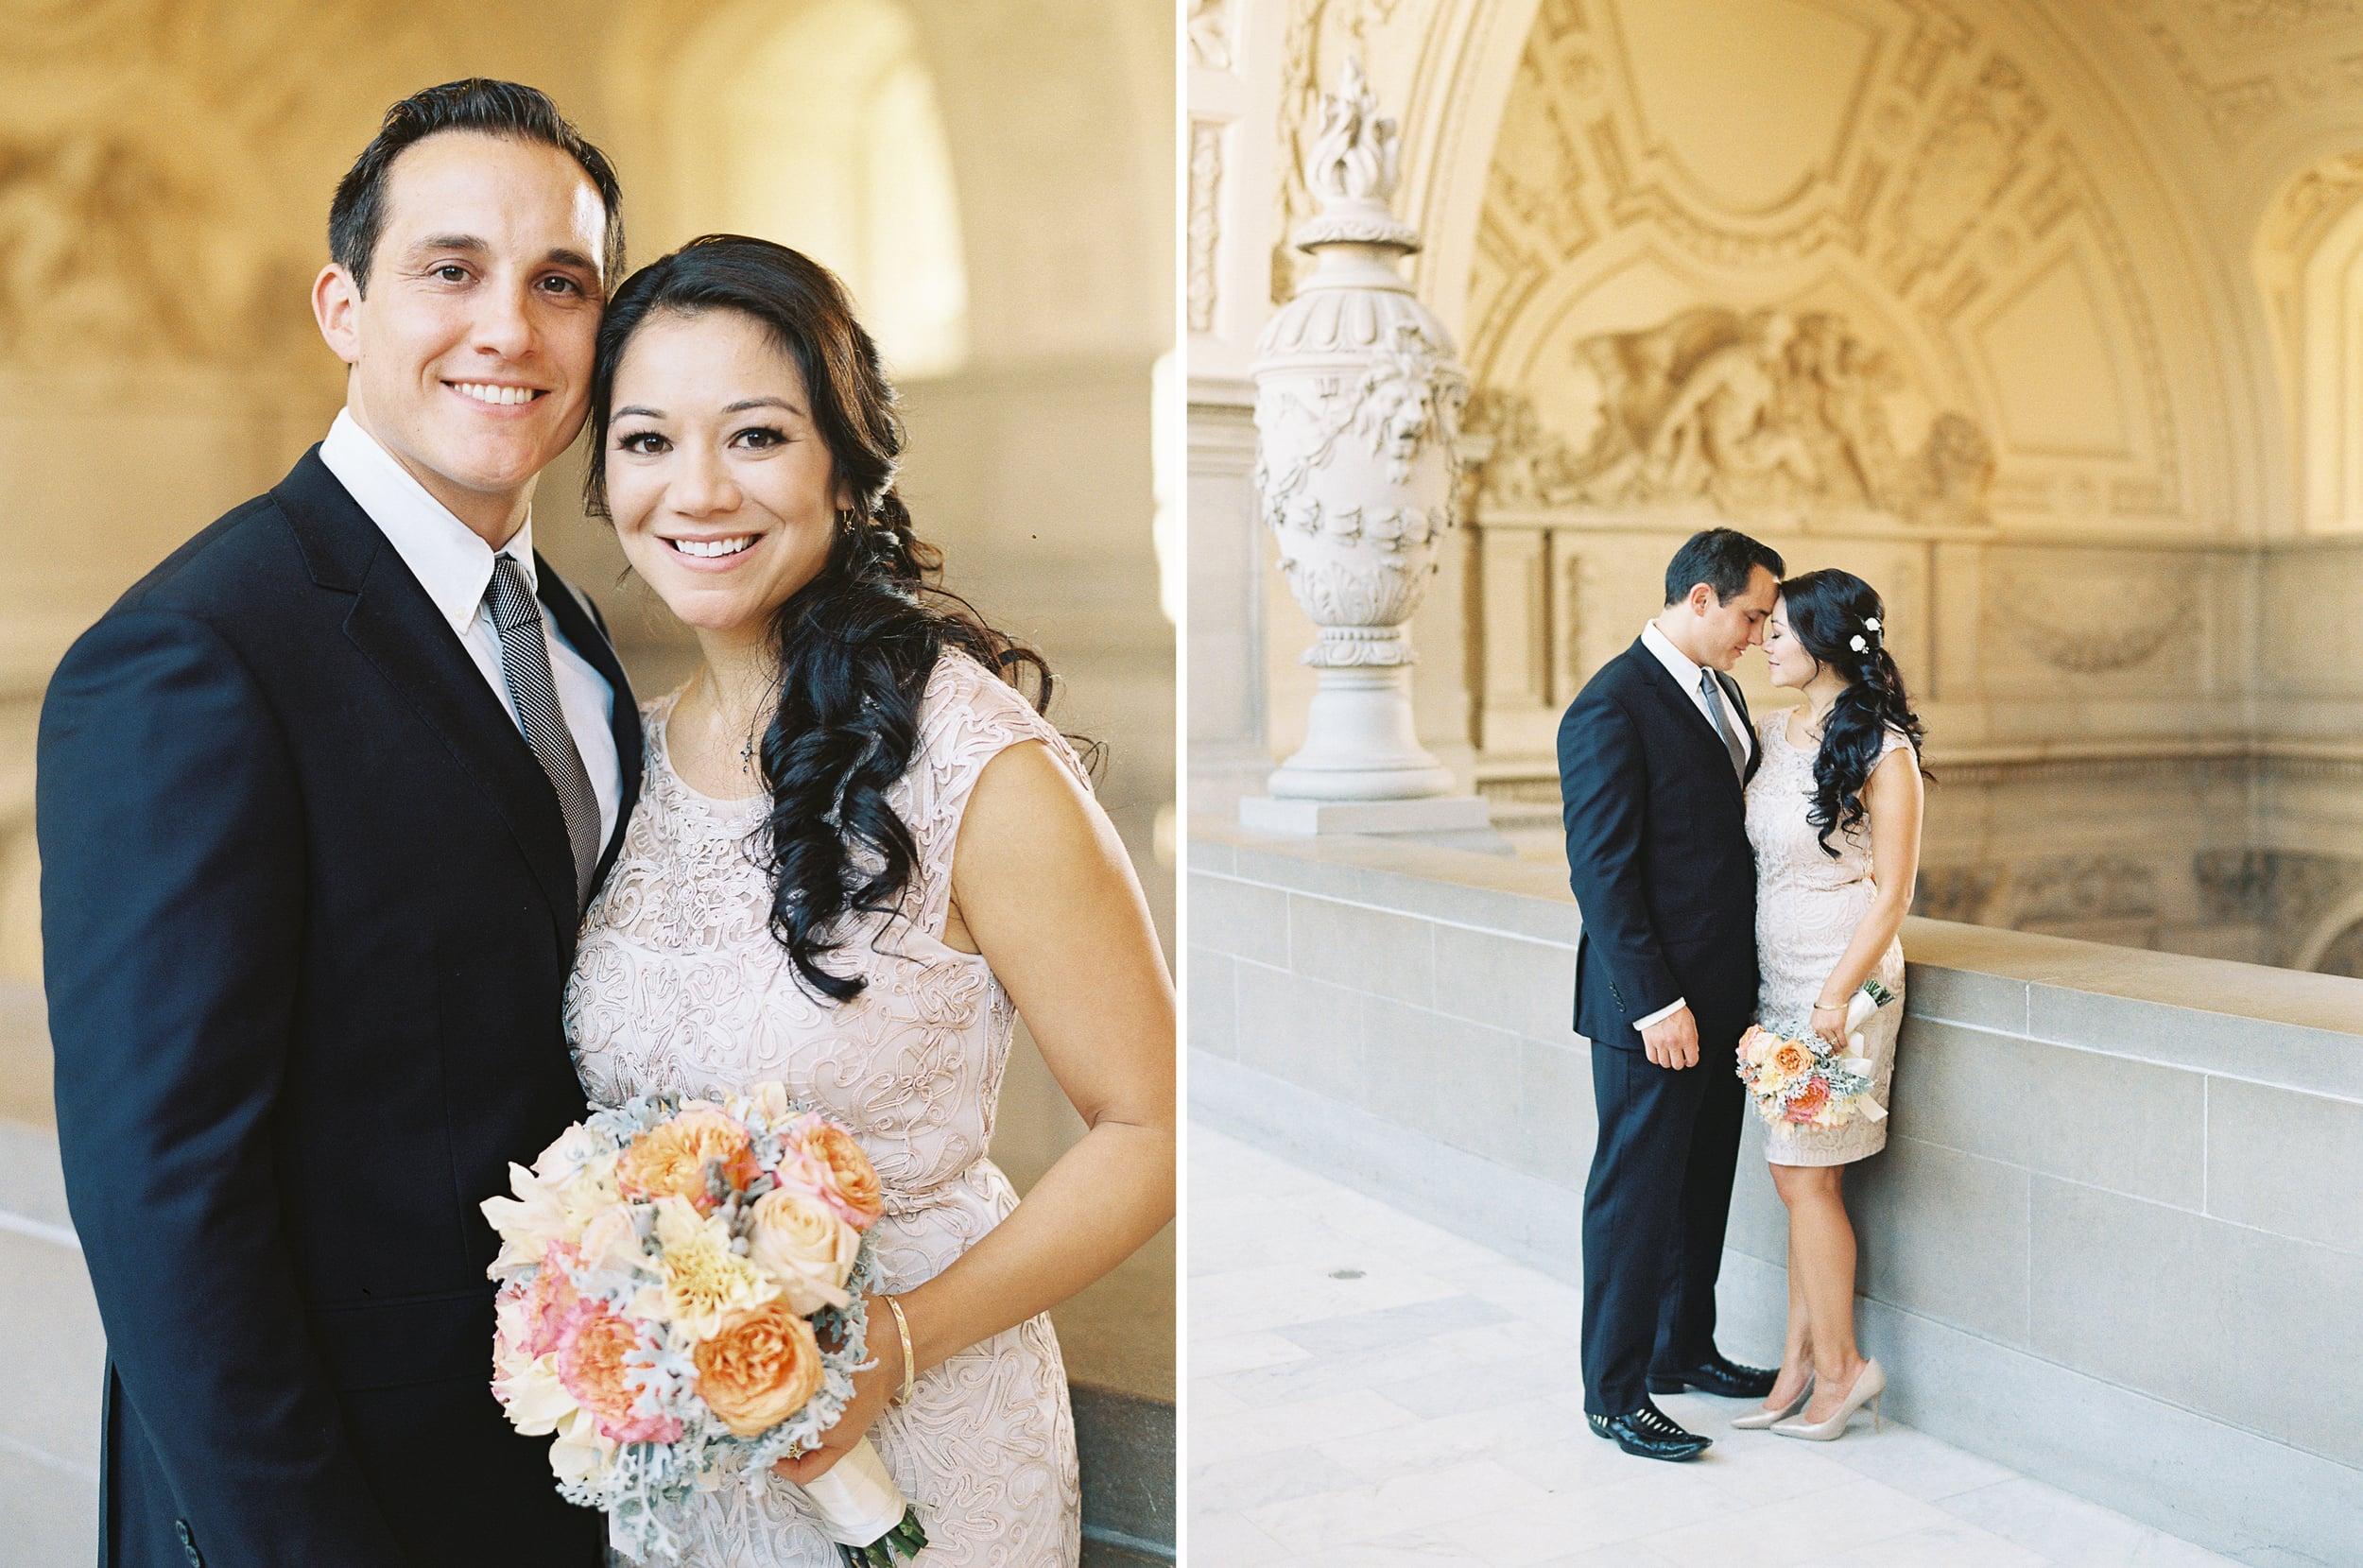 Meghan Mehan Photography - Fine Art Film Wedding Photography - California   San Francisco   Napa   Sonoma   Carmel   Big Sur   Nashville   Tennessee - 050.jpg